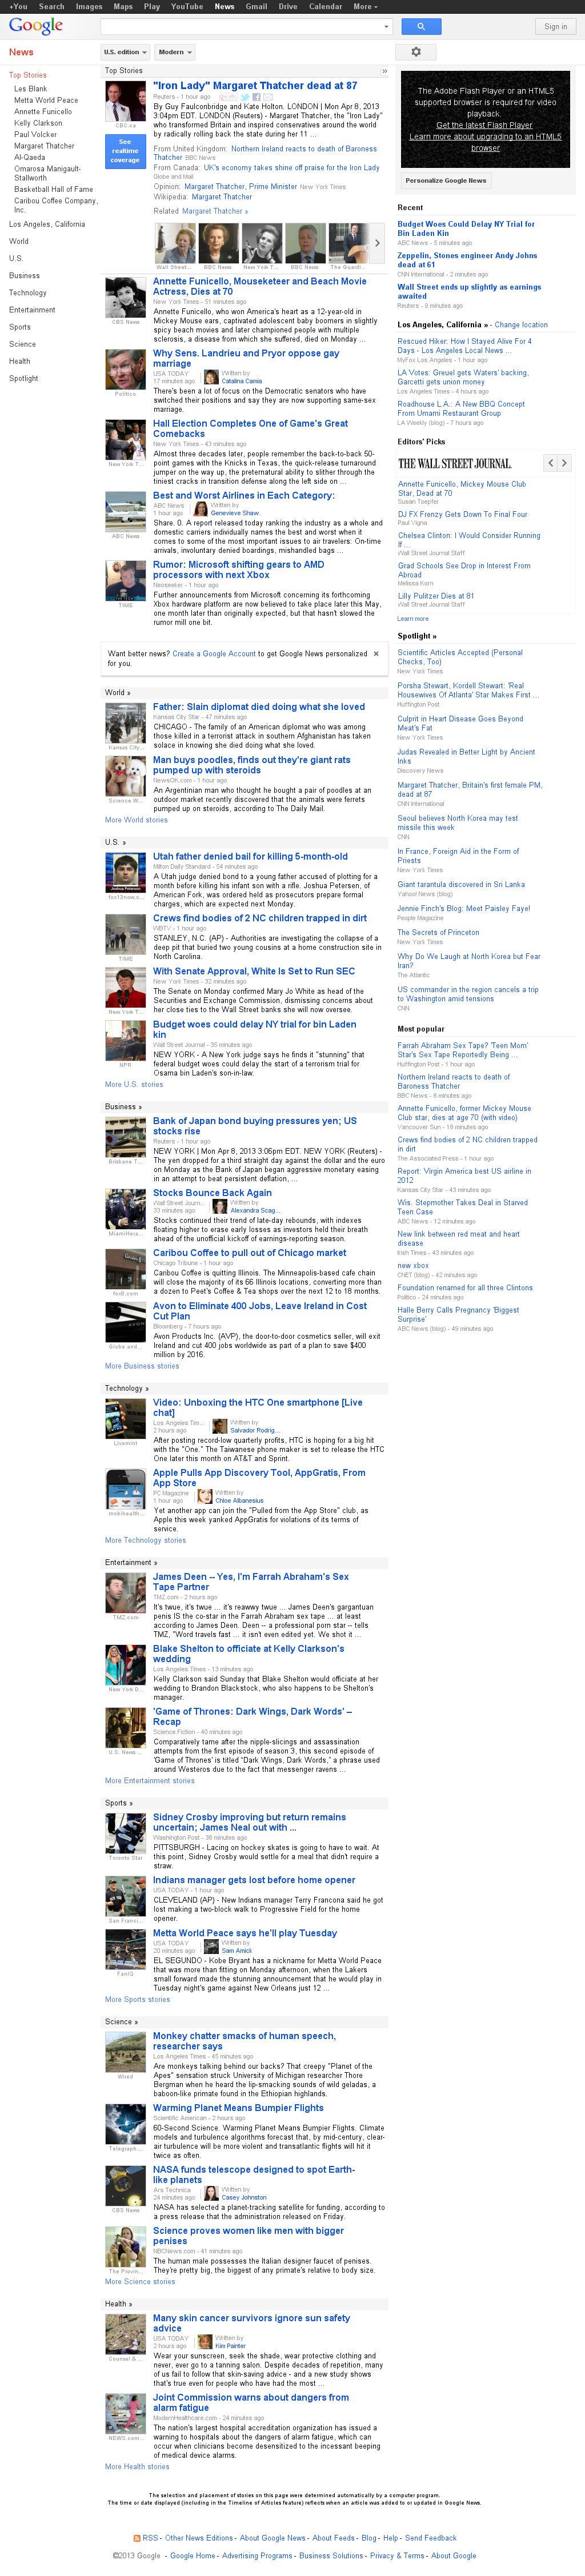 Google News at Monday April 8, 2013, 8:17 p.m. UTC